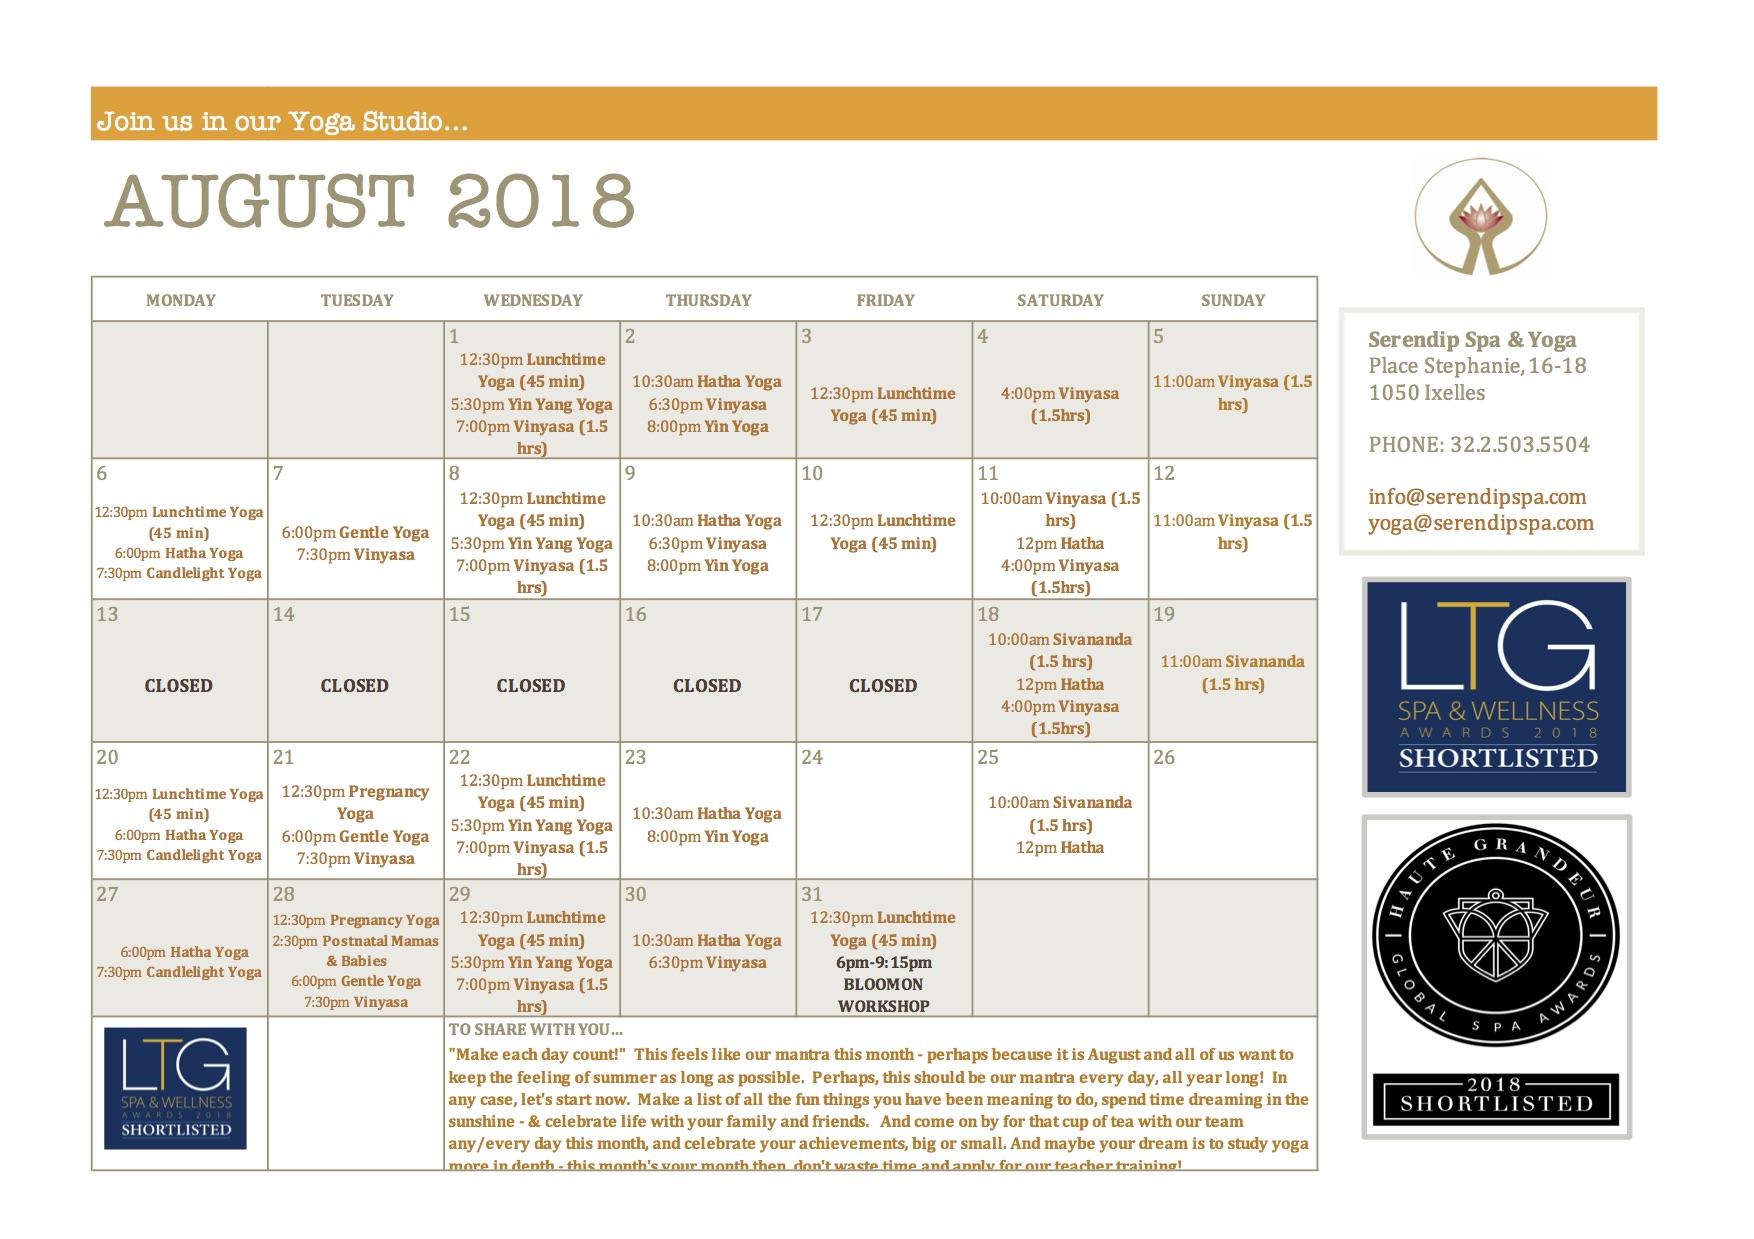 serendip spa and yoga calendar 2018_August A4 FRONT.jpg